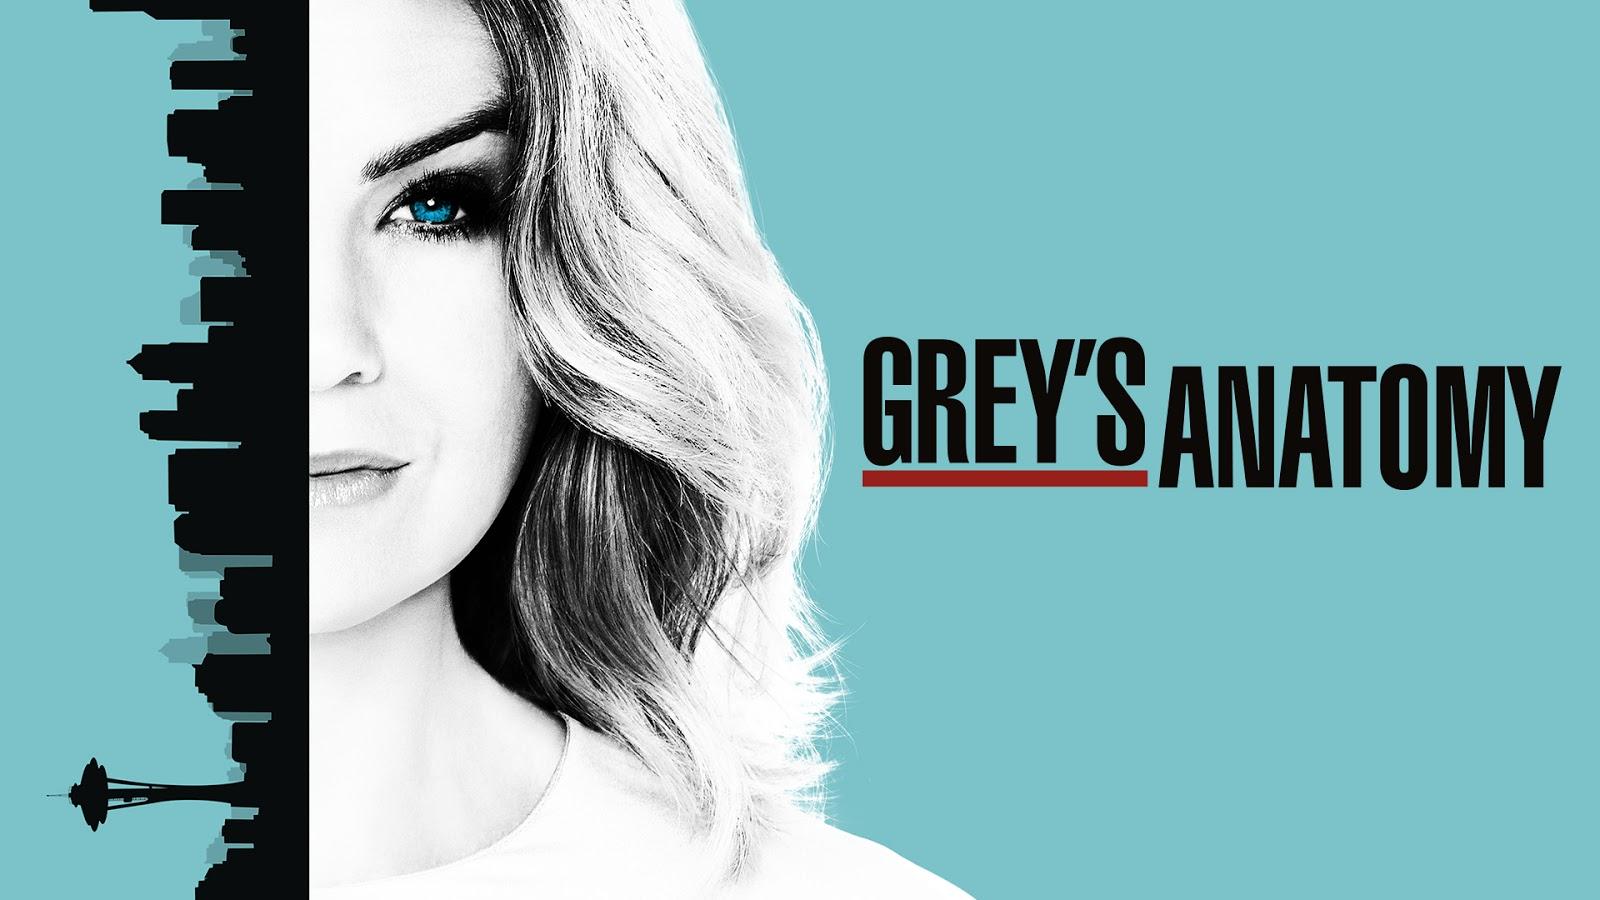 How to watch Grey\'s Anatomy Season 14 Episodes online